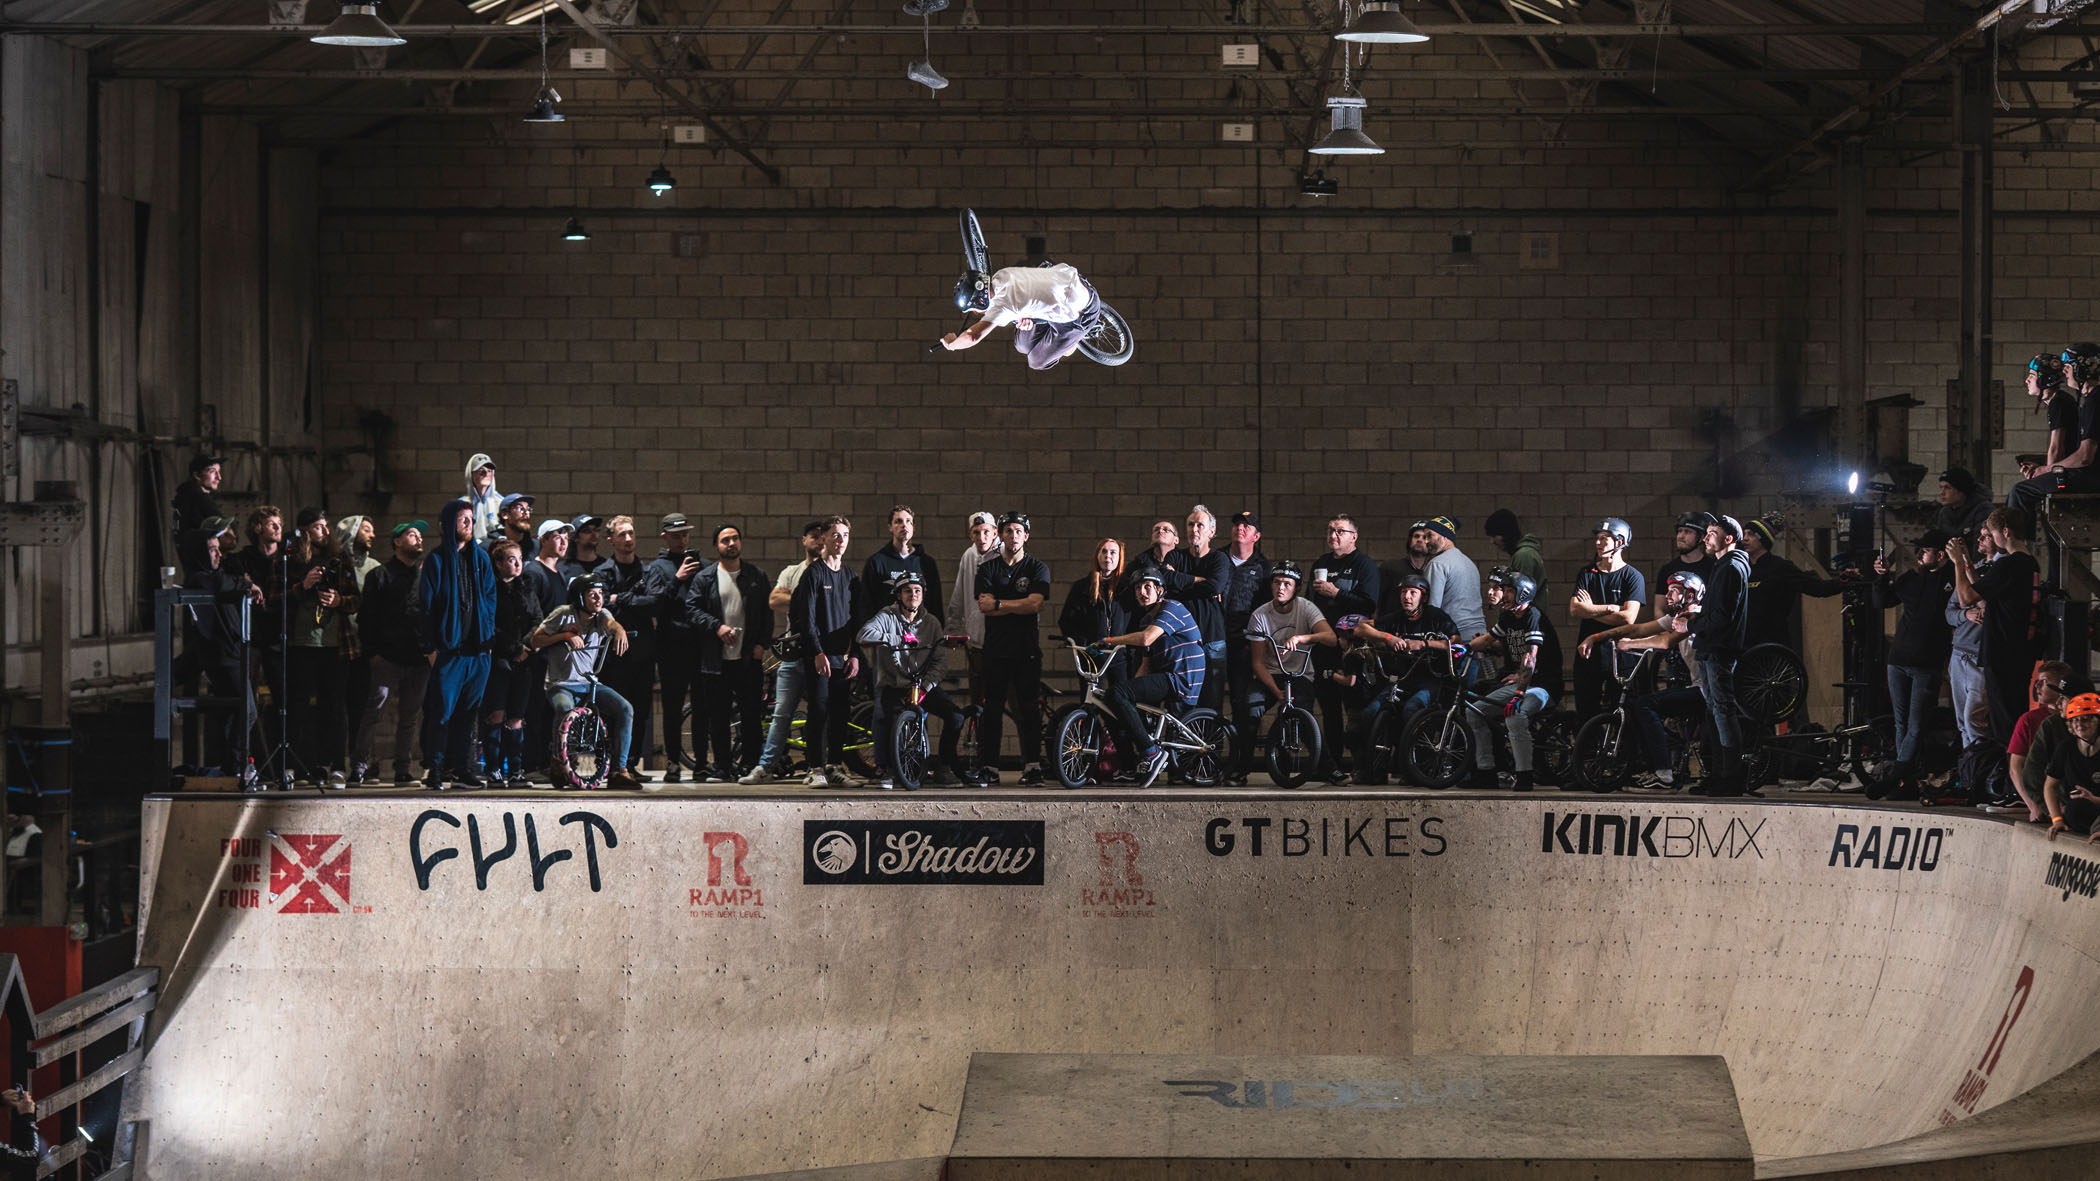 BACKYARD JAM 2019: R3 Ramp1 Skatepark - Video, Gallery & Results